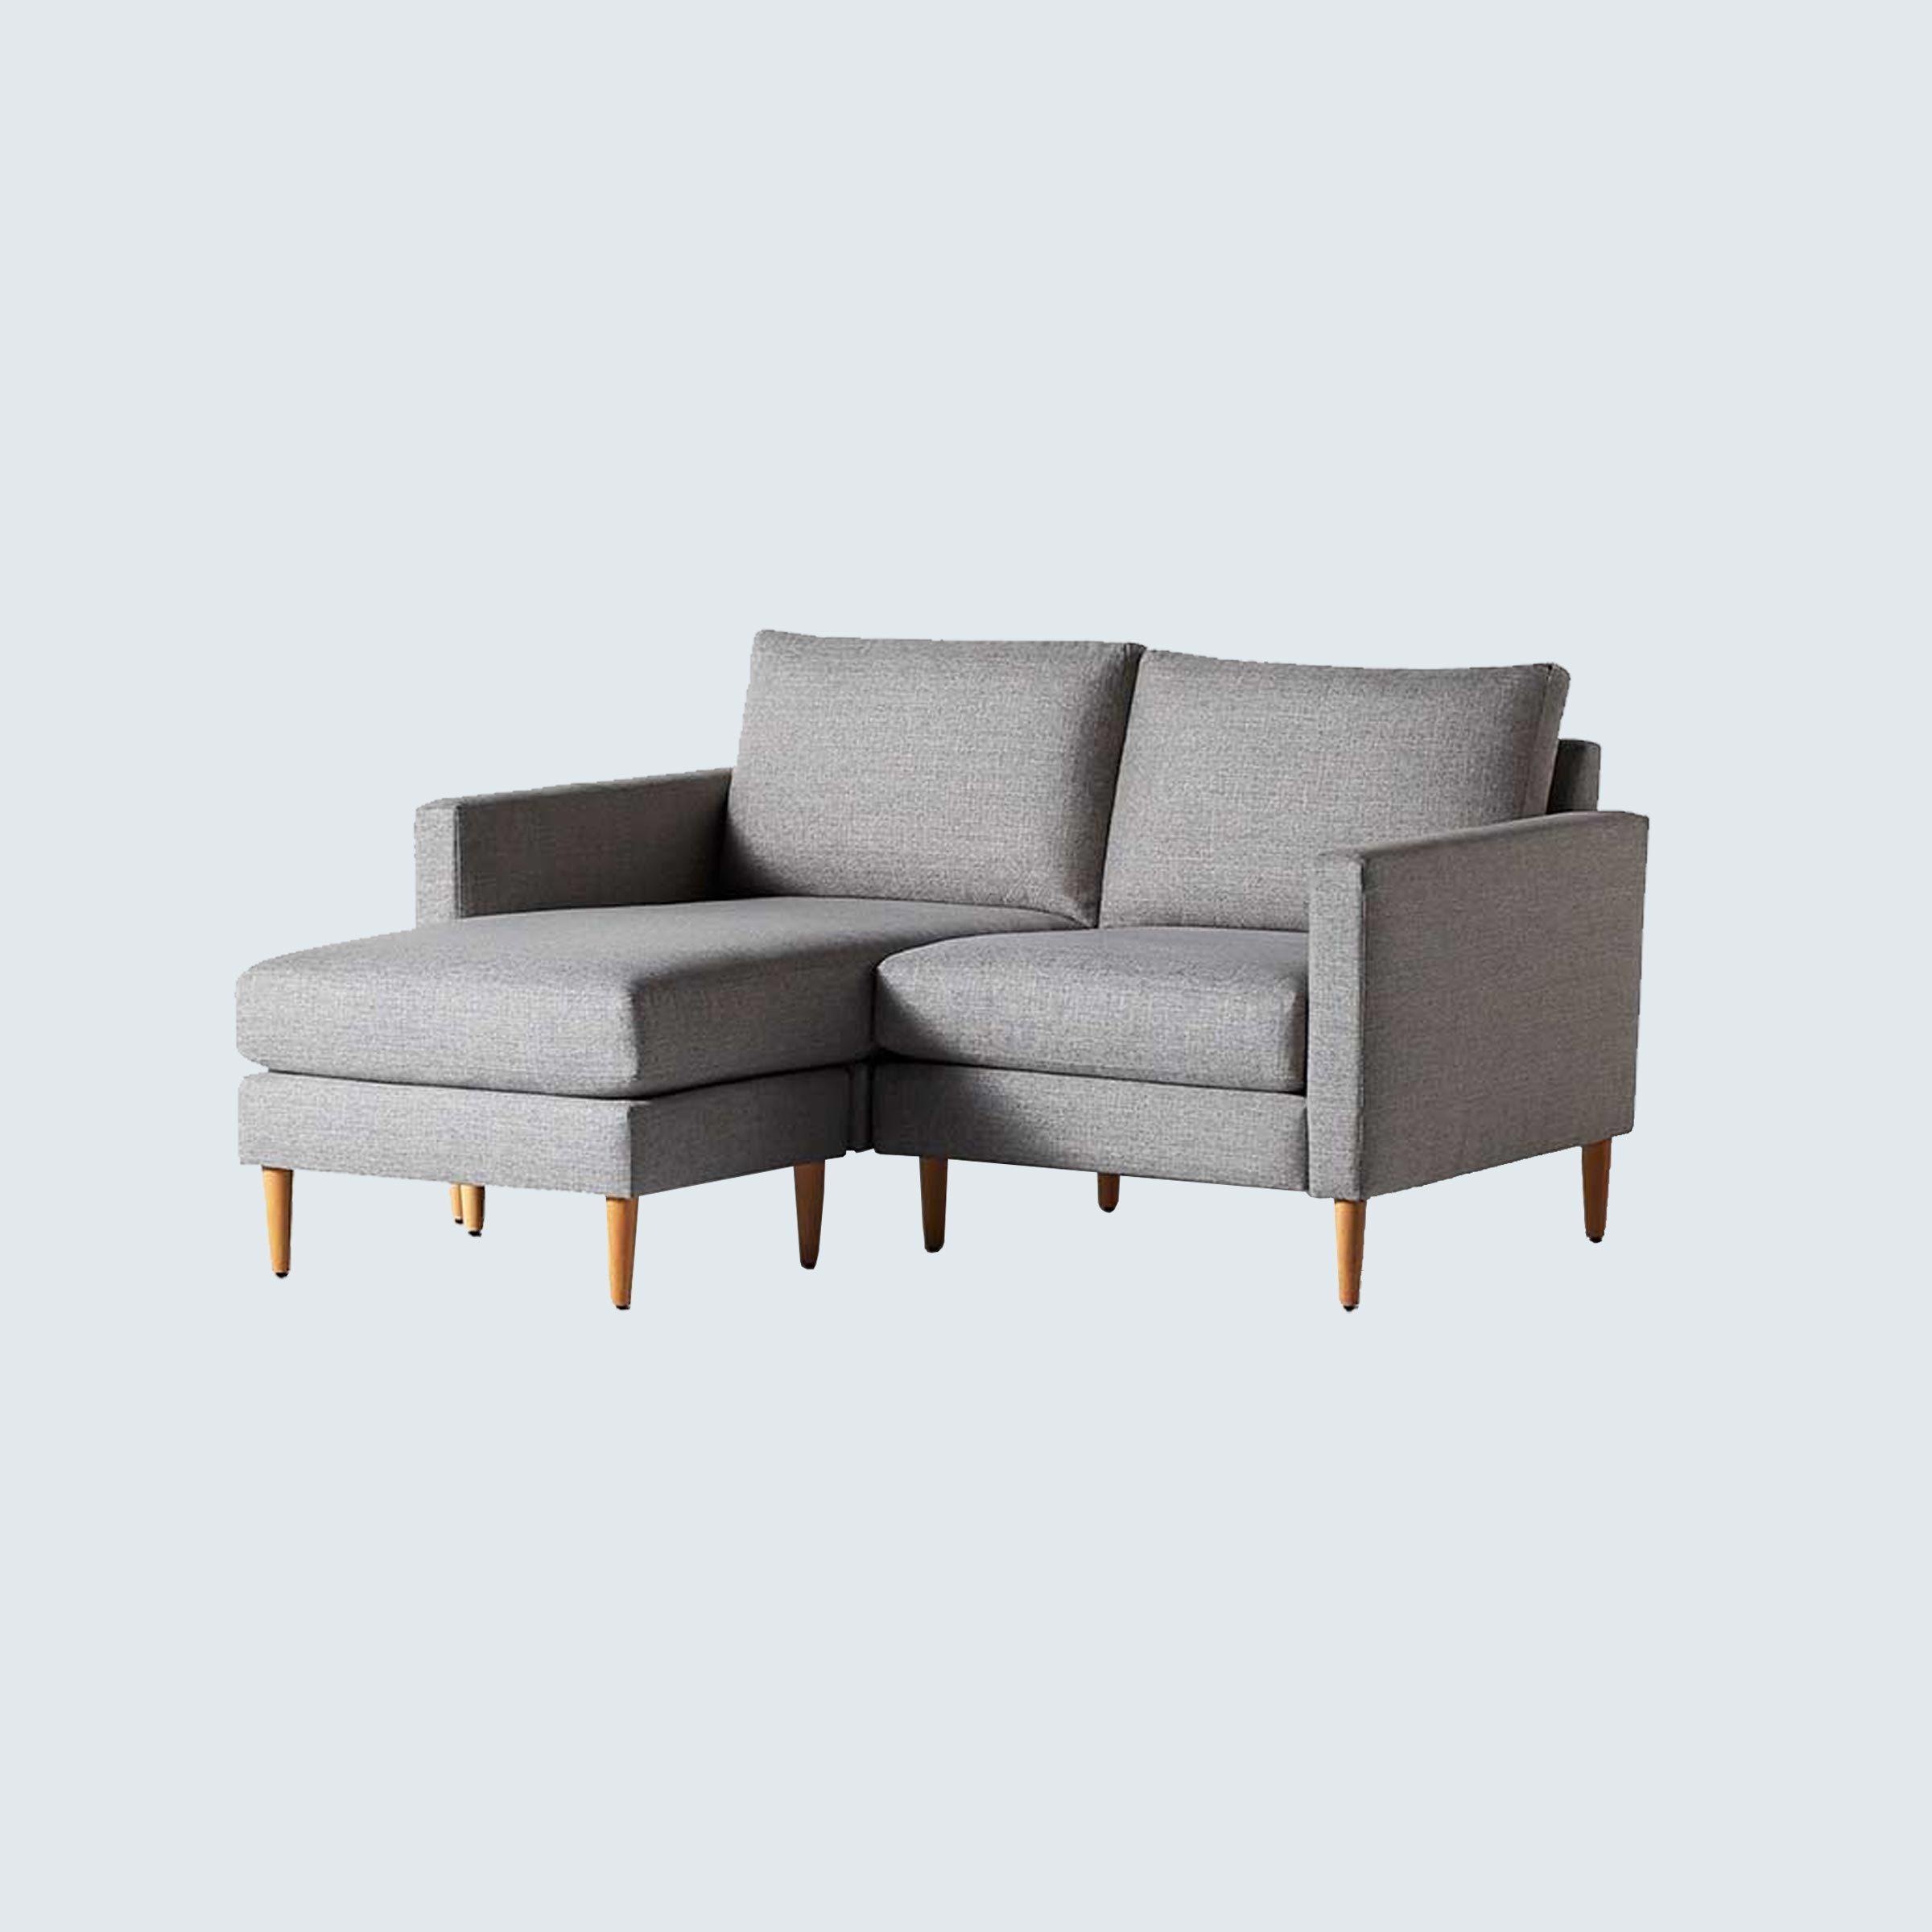 Allform custom-made seating